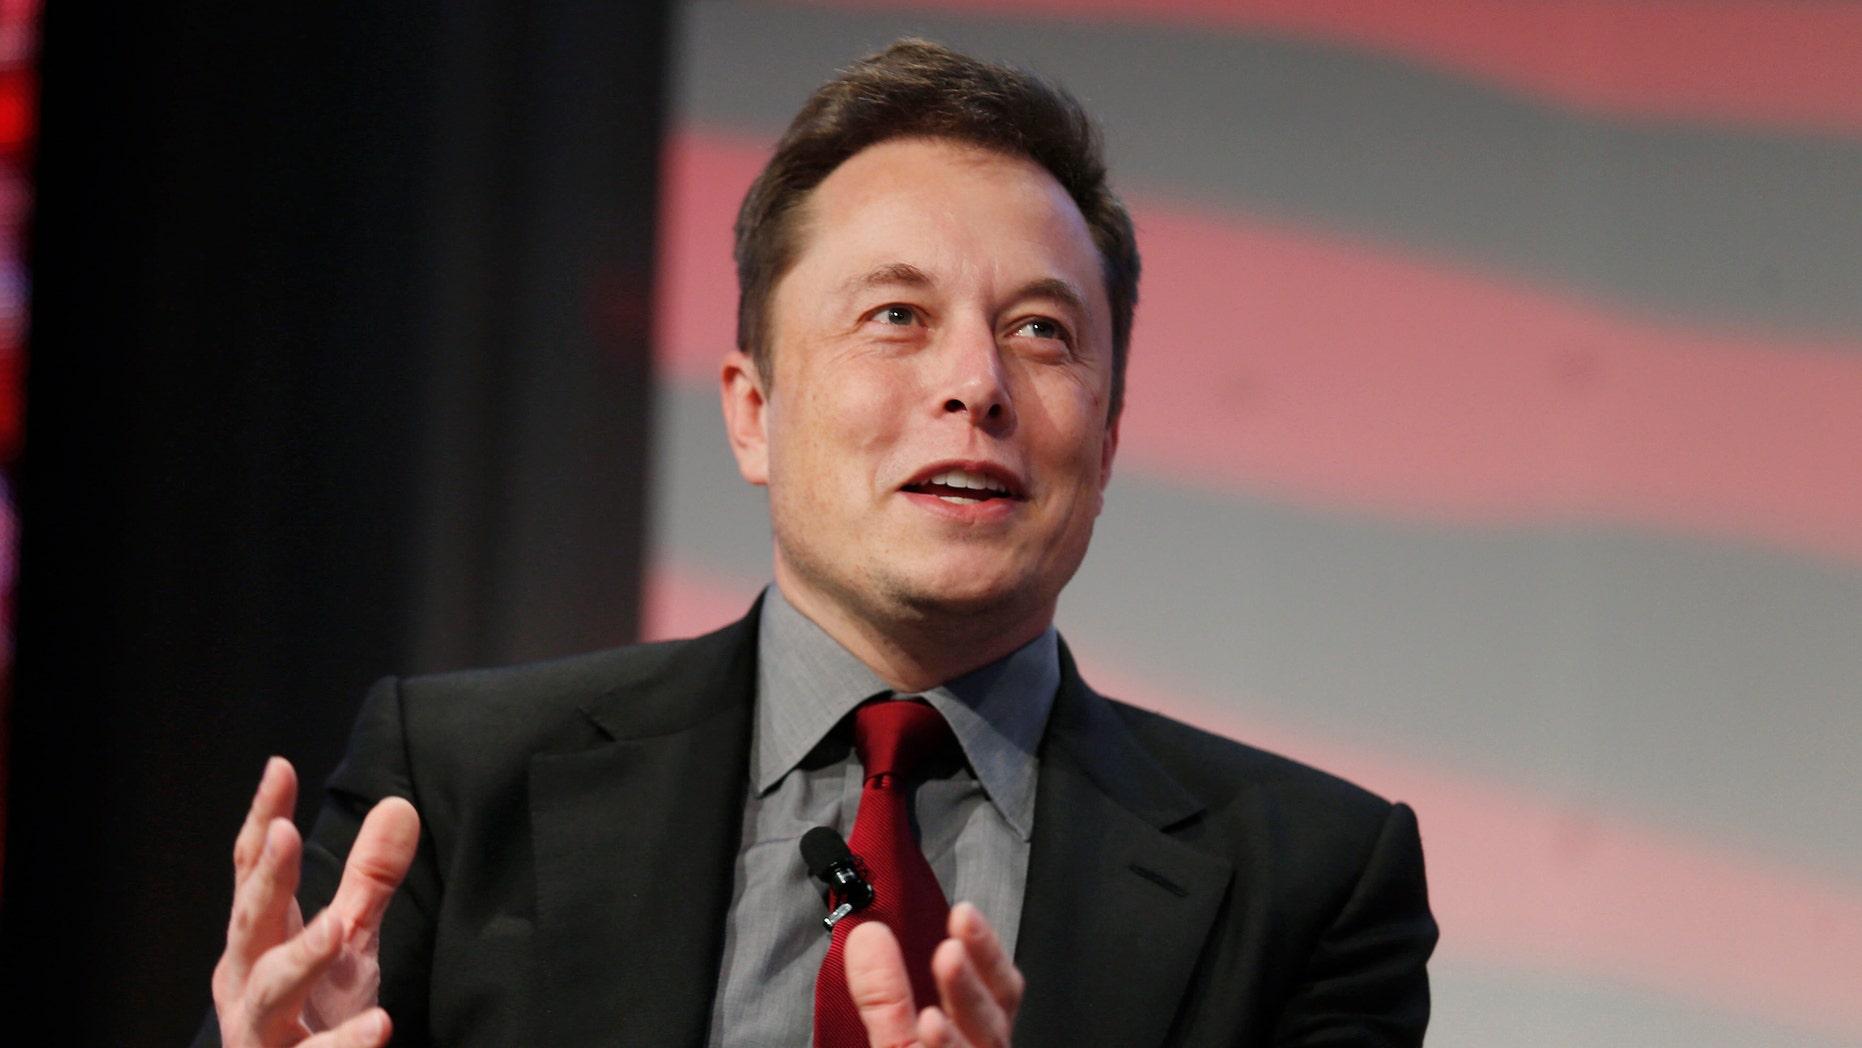 File photo - Tesla Motors CEO Elon Musk talks at the Automotive World News Congress at the Renaissance Center in Detroit, Michigan, Jan. 13, 2015. (REUTERS/Rebecca Cook)